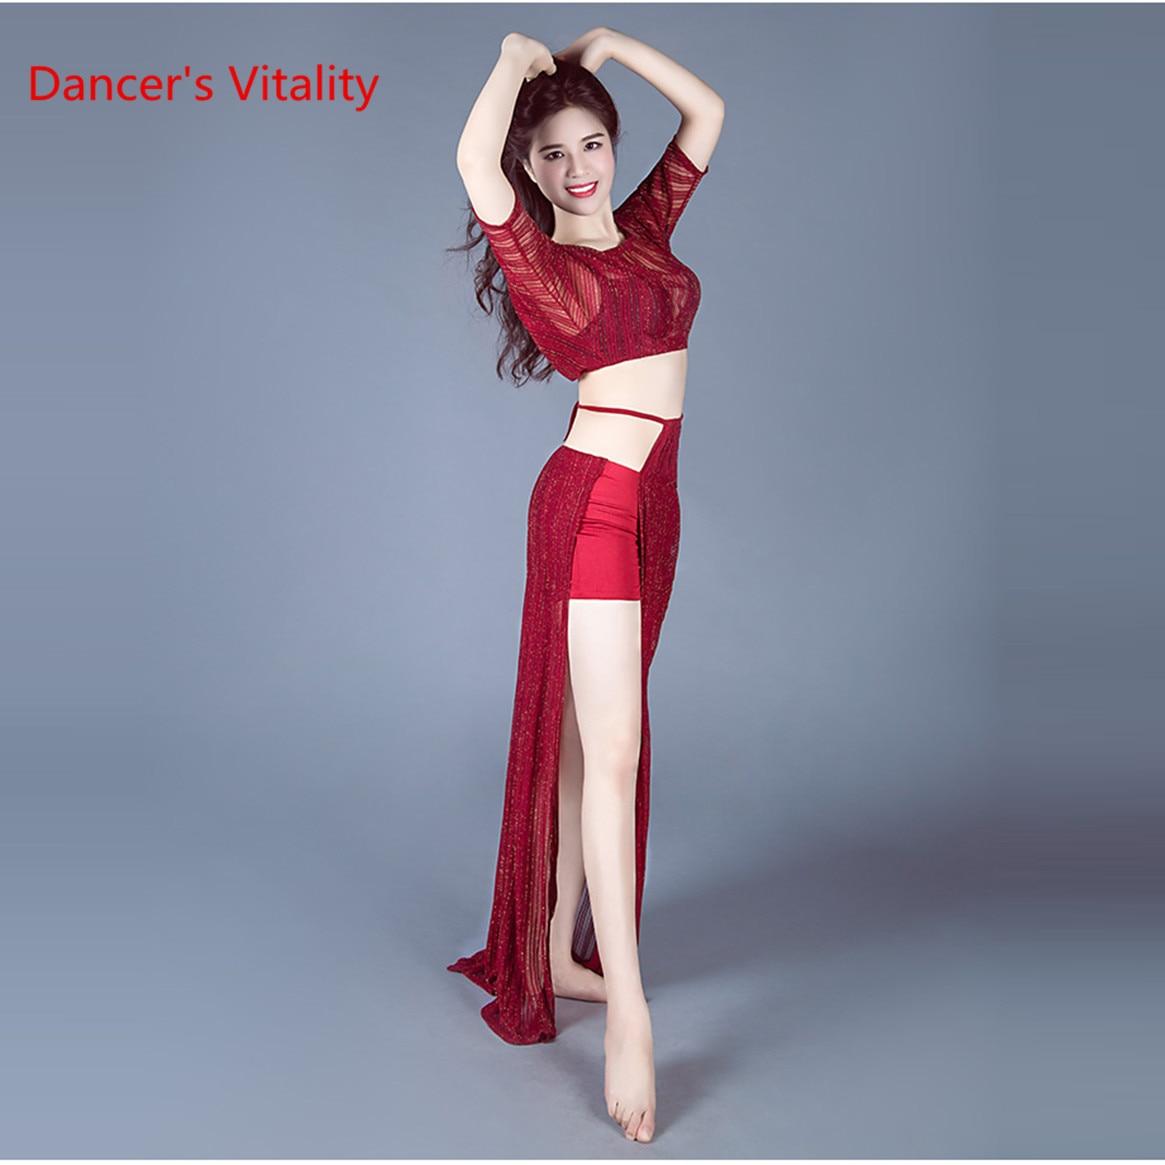 Big Size Lady's Loose Sexy Knitwear Professional Belly Dance 2 Piece Dancewear Long Sleeve Lateral Slit Women's Oriental Skirt